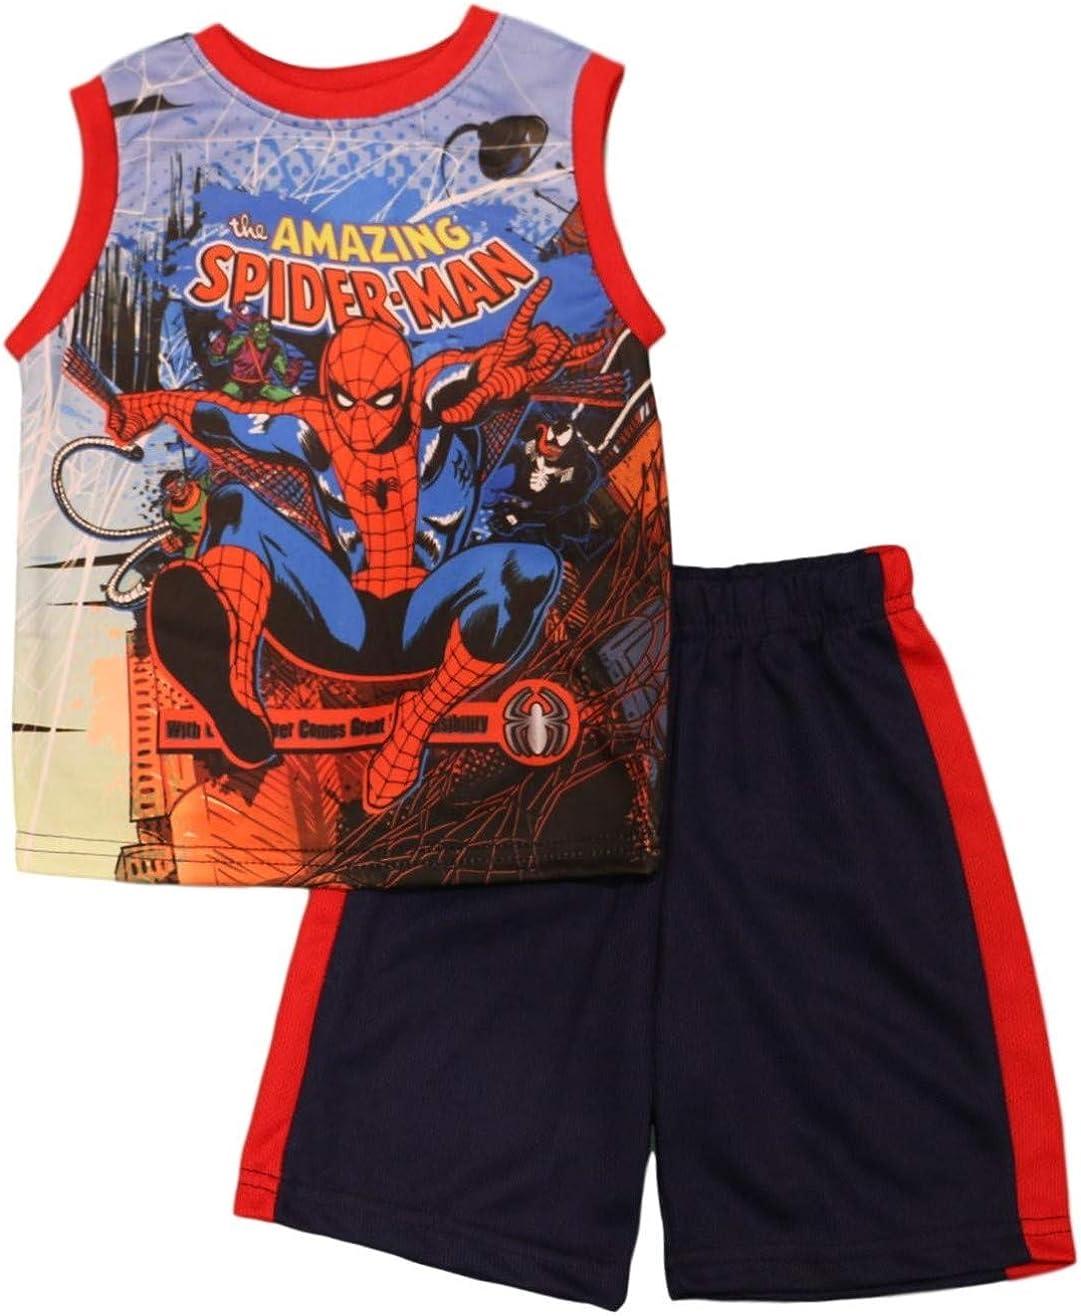 Spiderman Little Boys' Sublimated Shorts Set